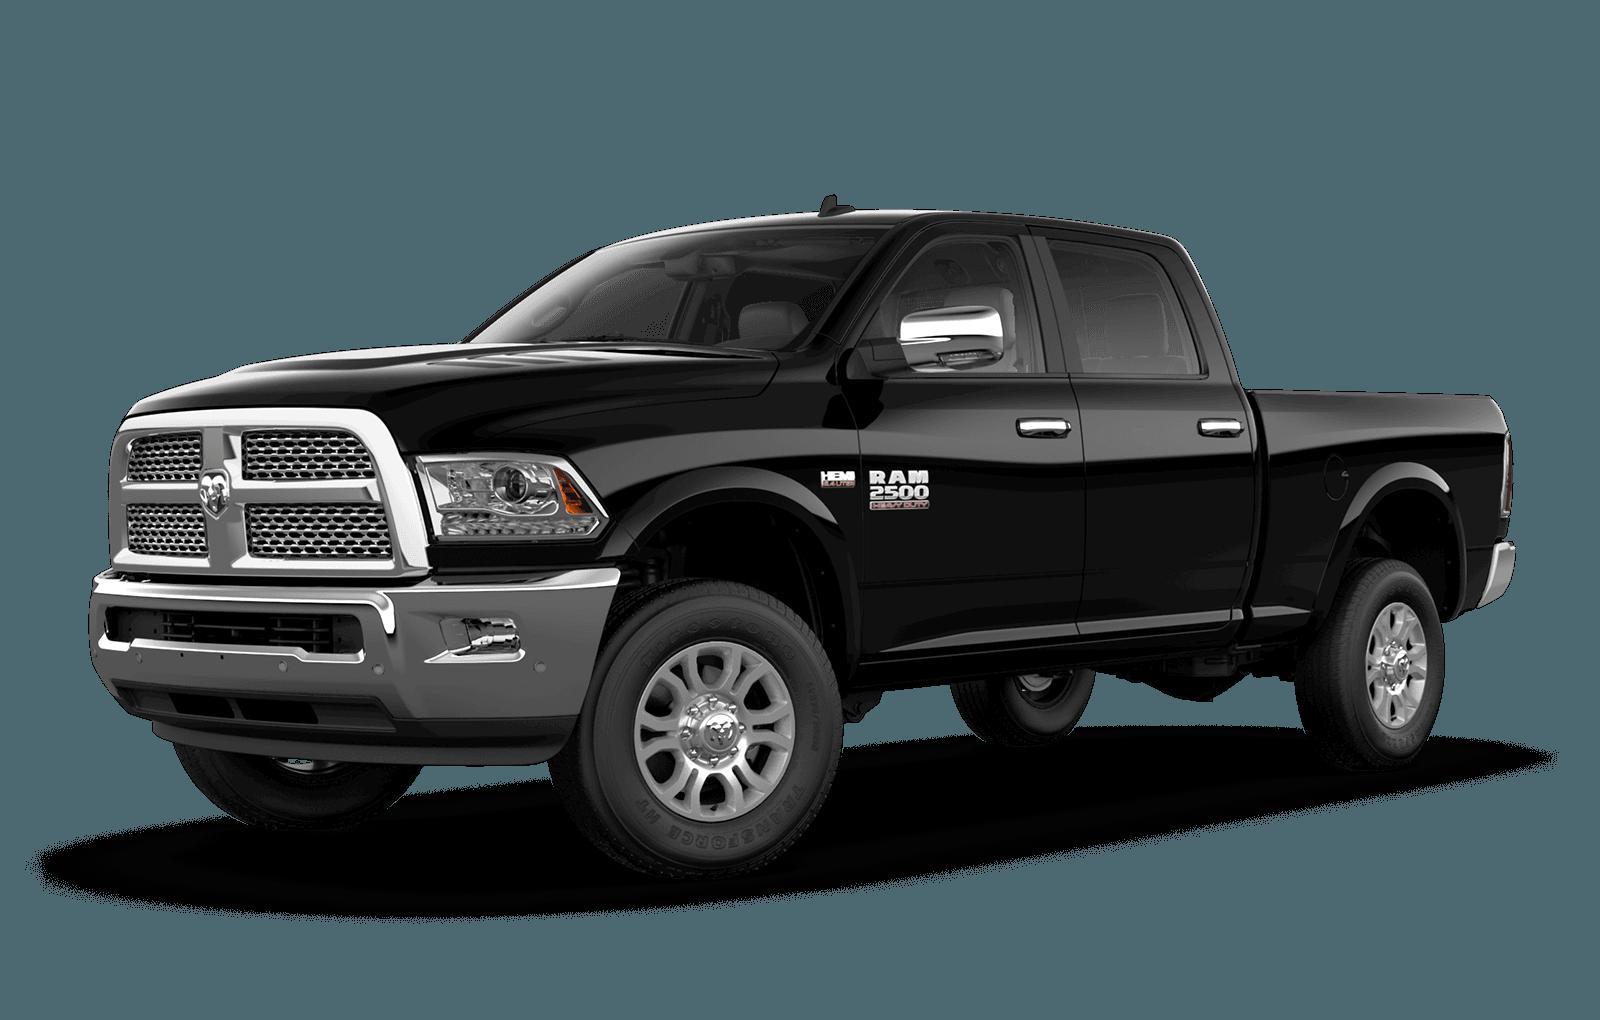 2018 RAM 2500 Pickup Truck | RAM Trucks Canada